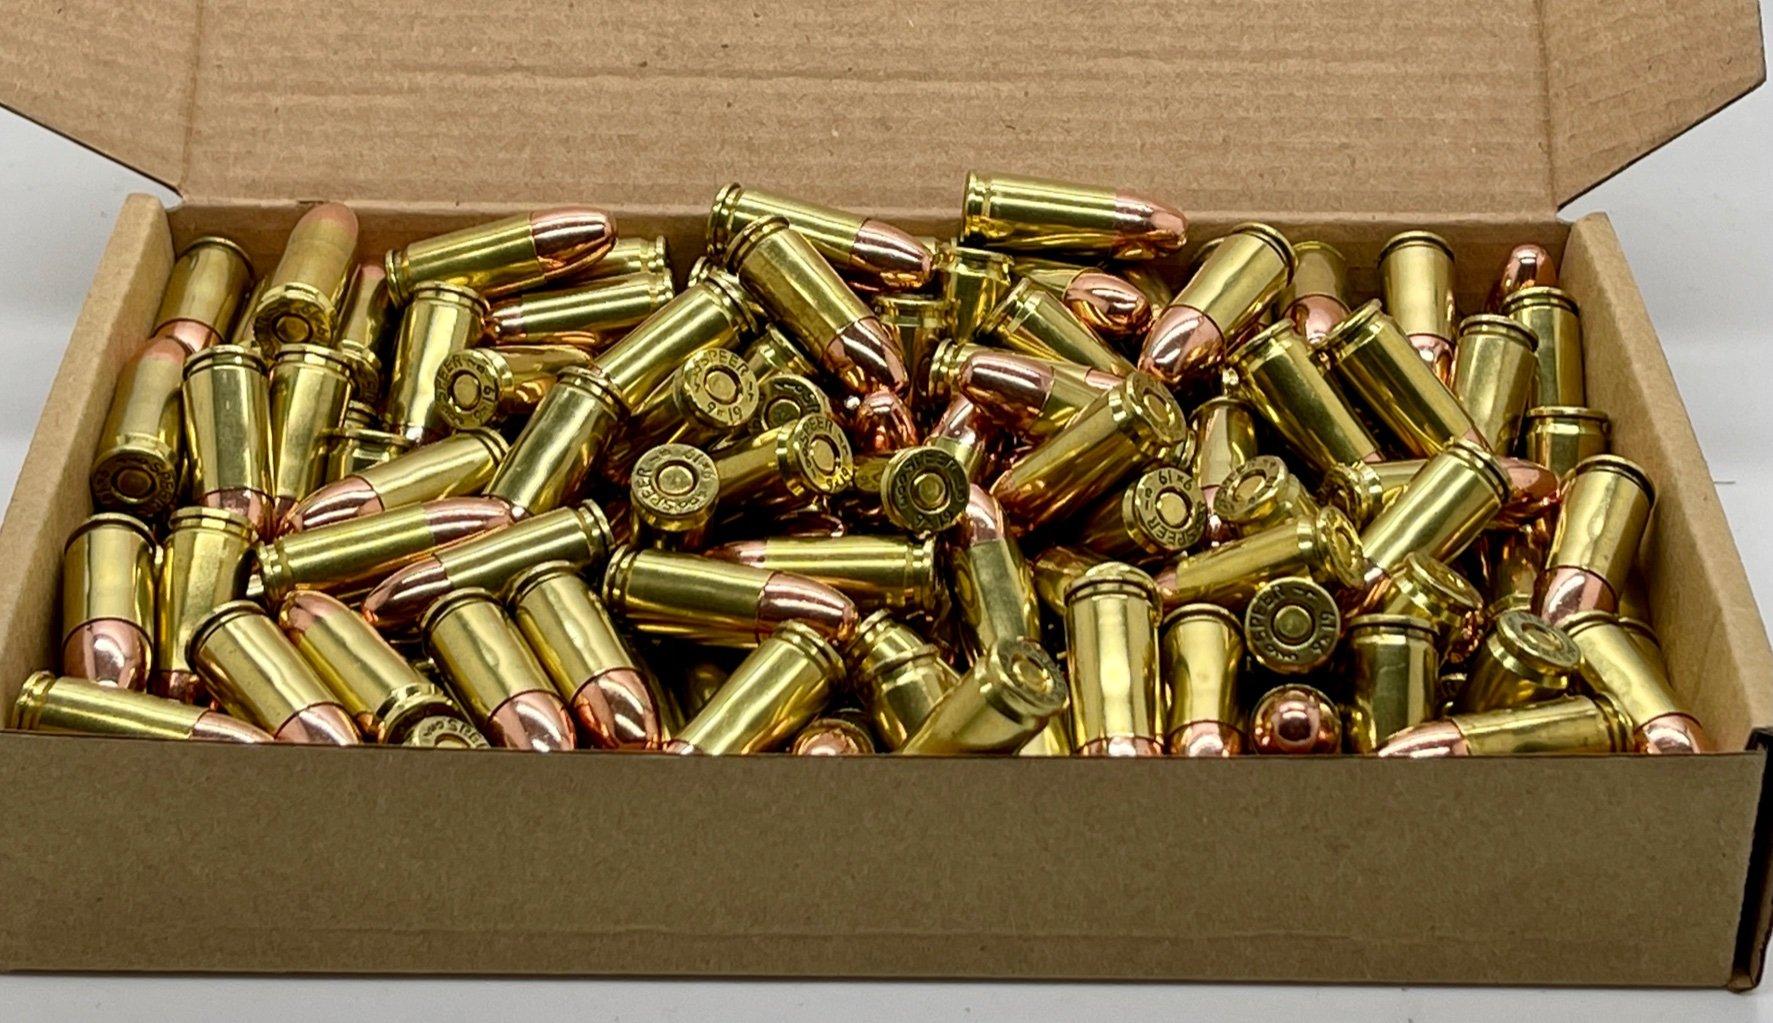 ZMA Ammo Premium 9x19mm 200 stk. 124gr. RN copper-plated